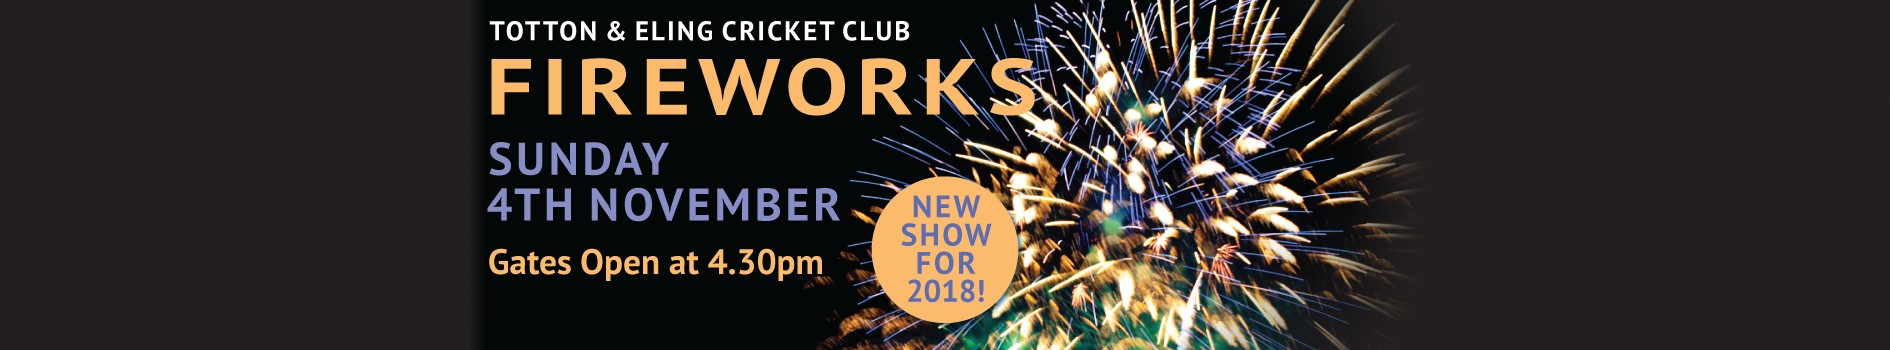 Totton & Eling CC - Fireworks 2018